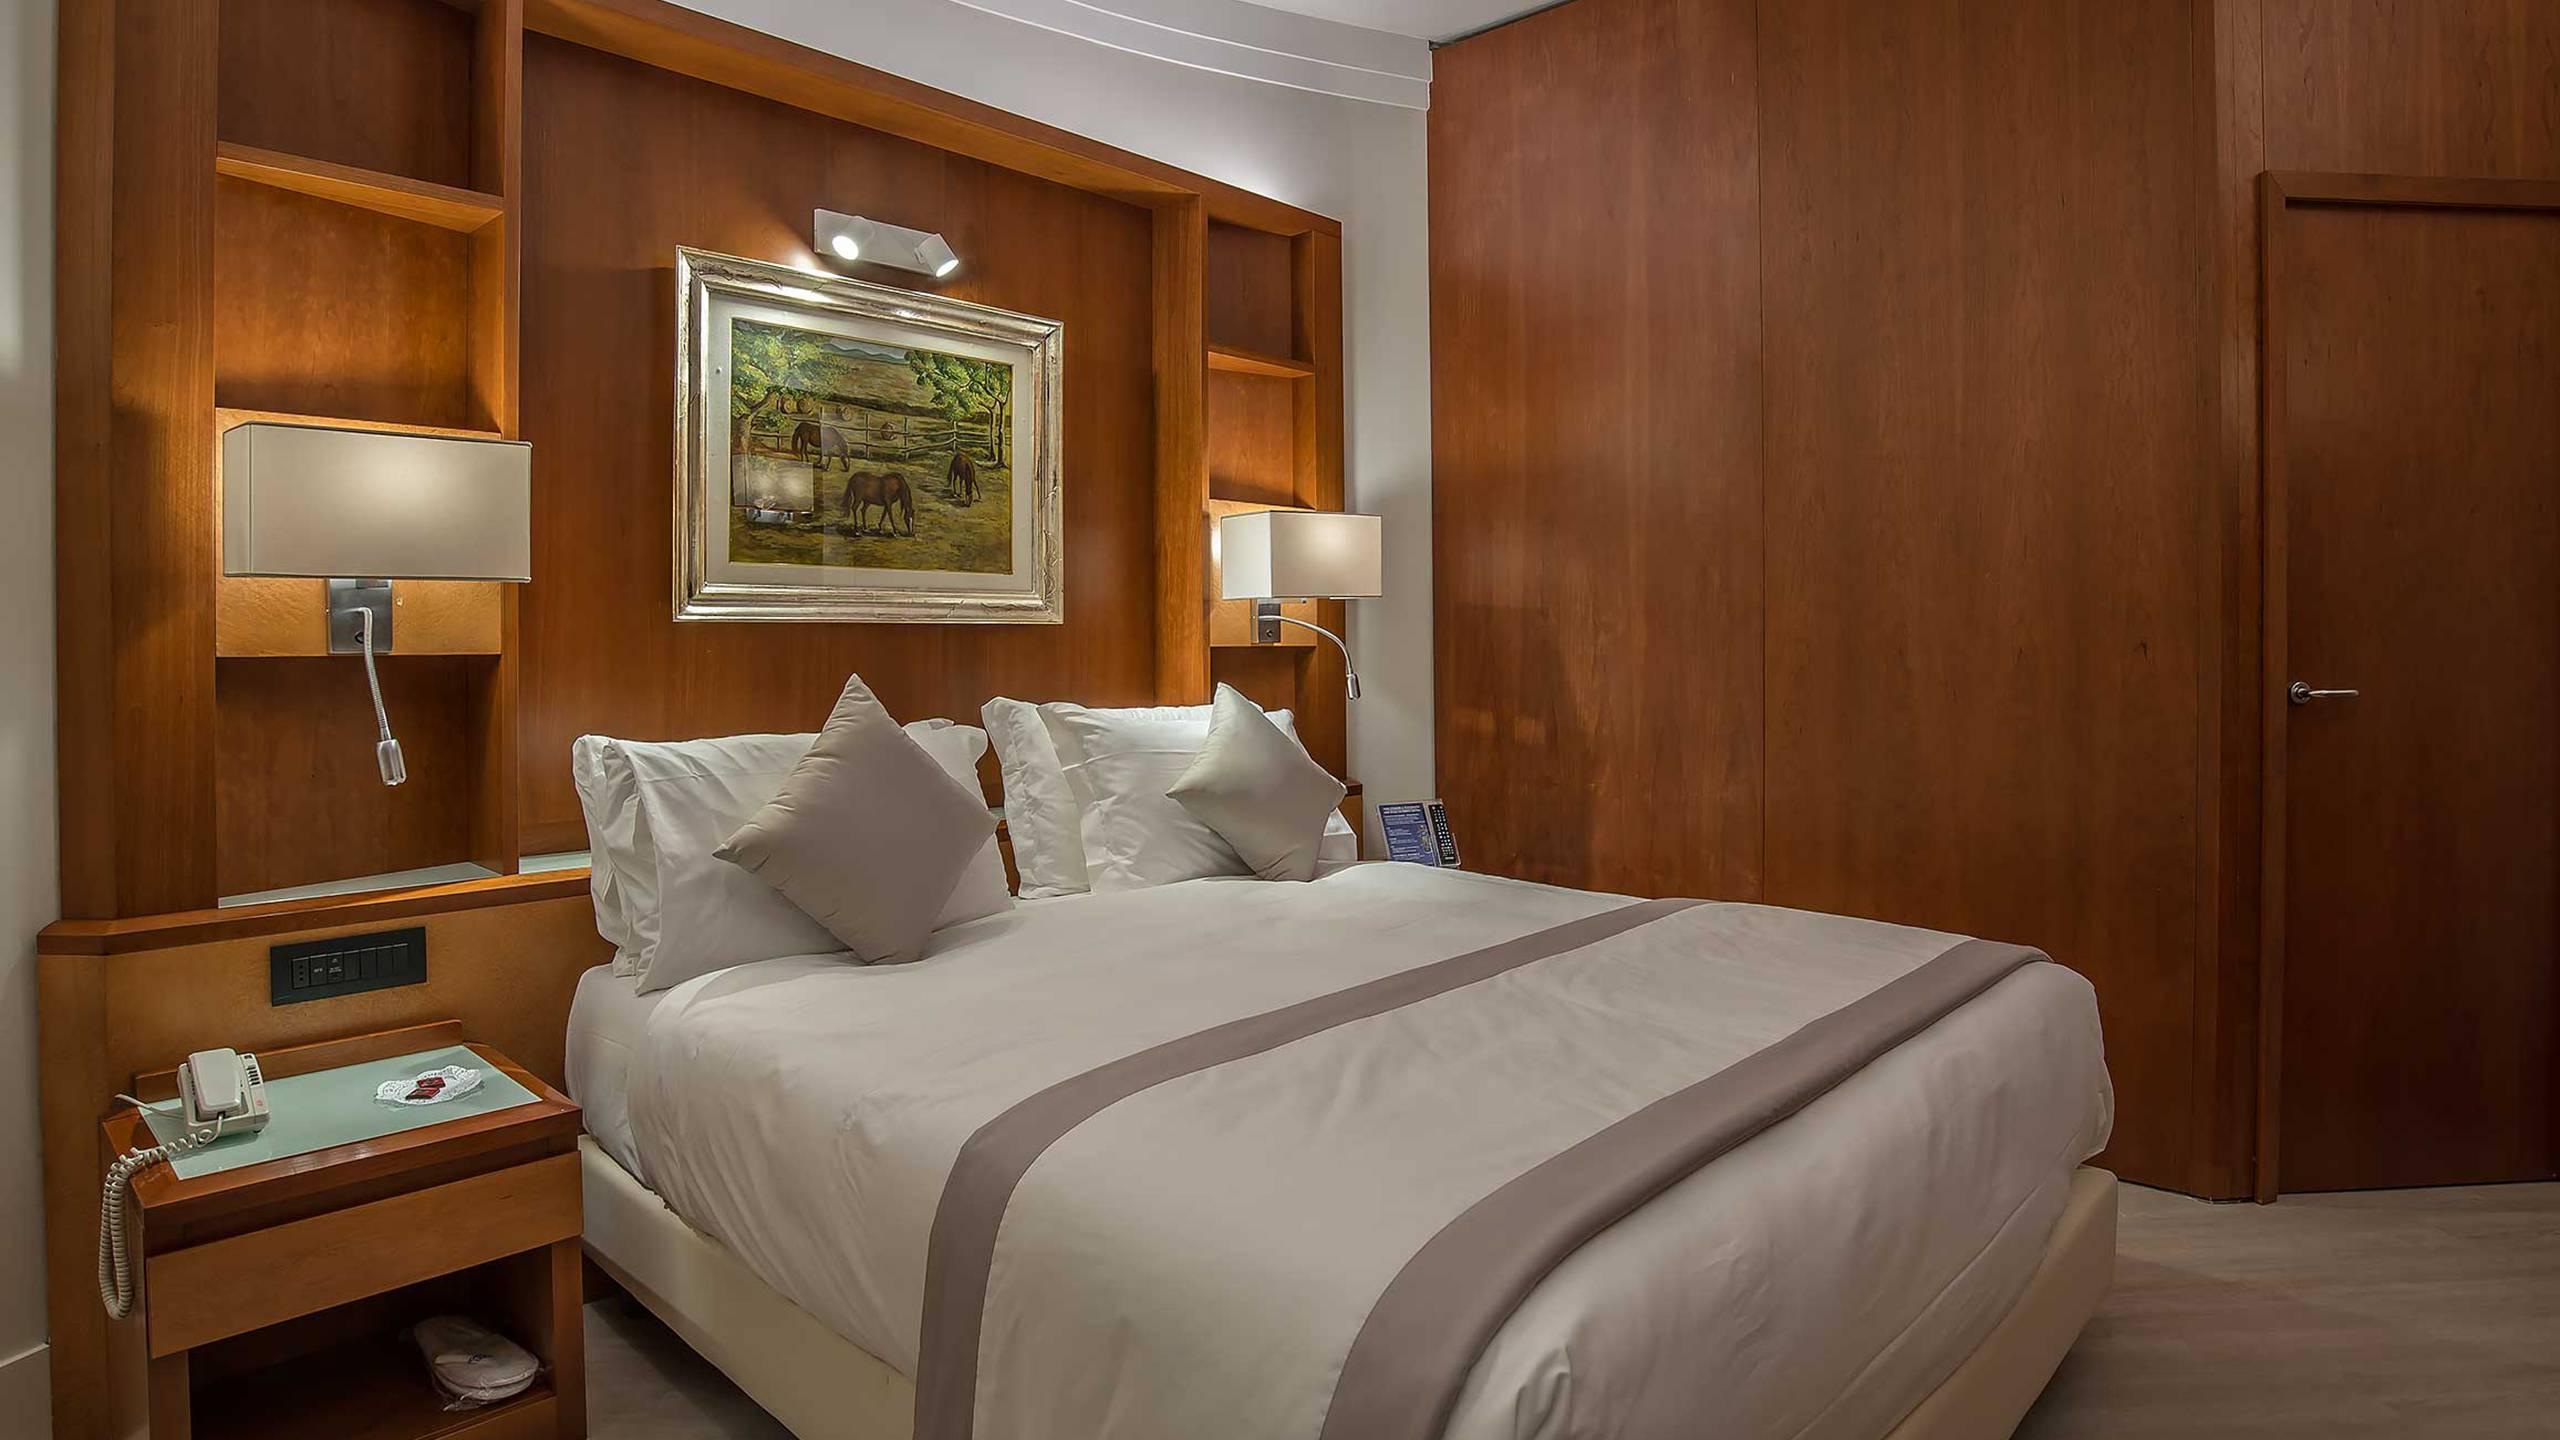 Hotel-La-Giocca-Roma-junior-suite-8